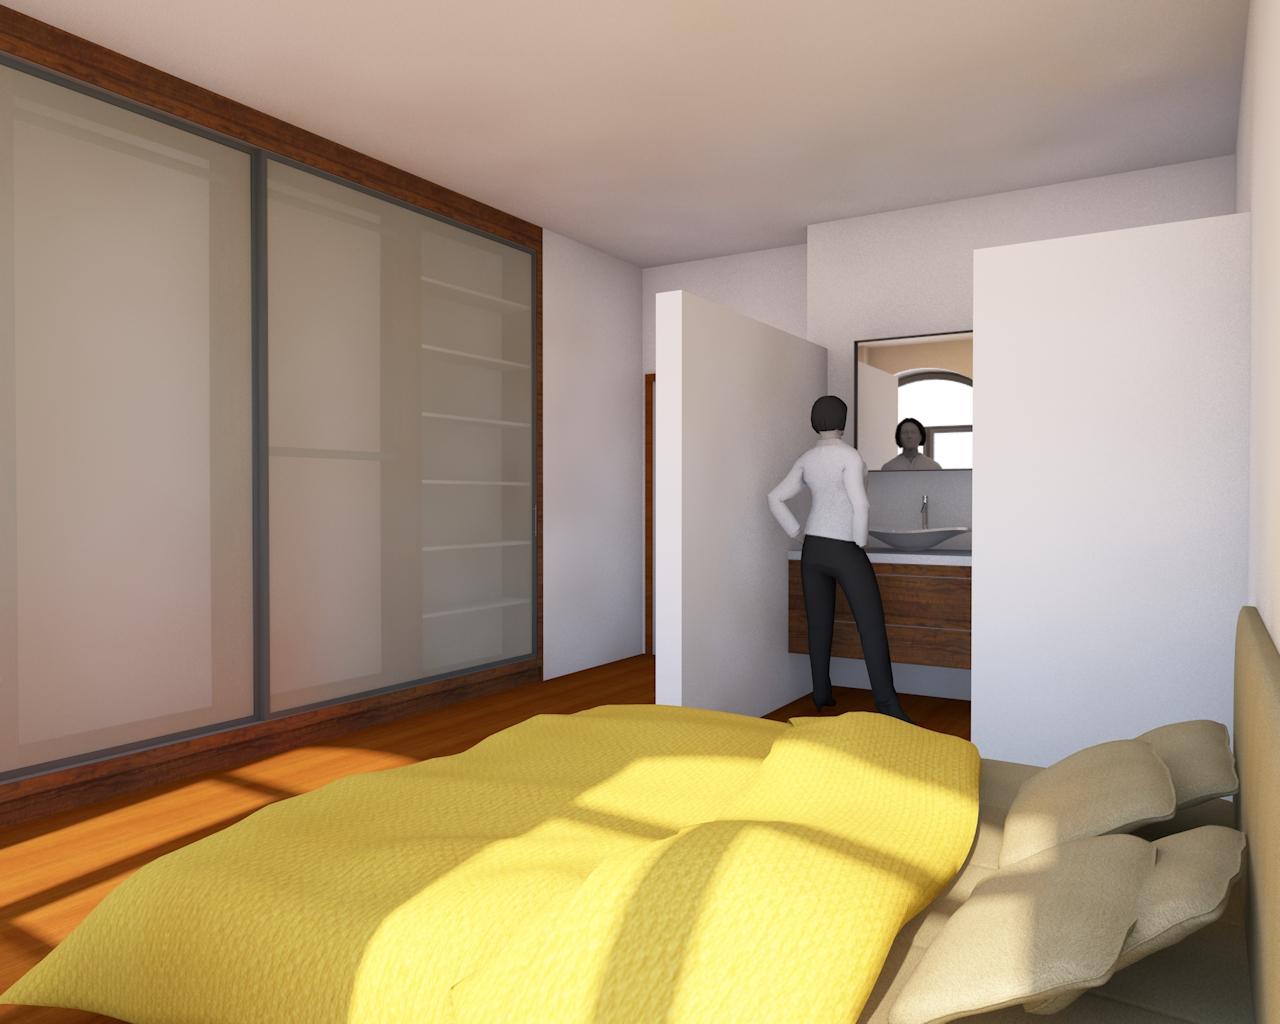 Deco slaapkamer - Deco design slaapkamer ...